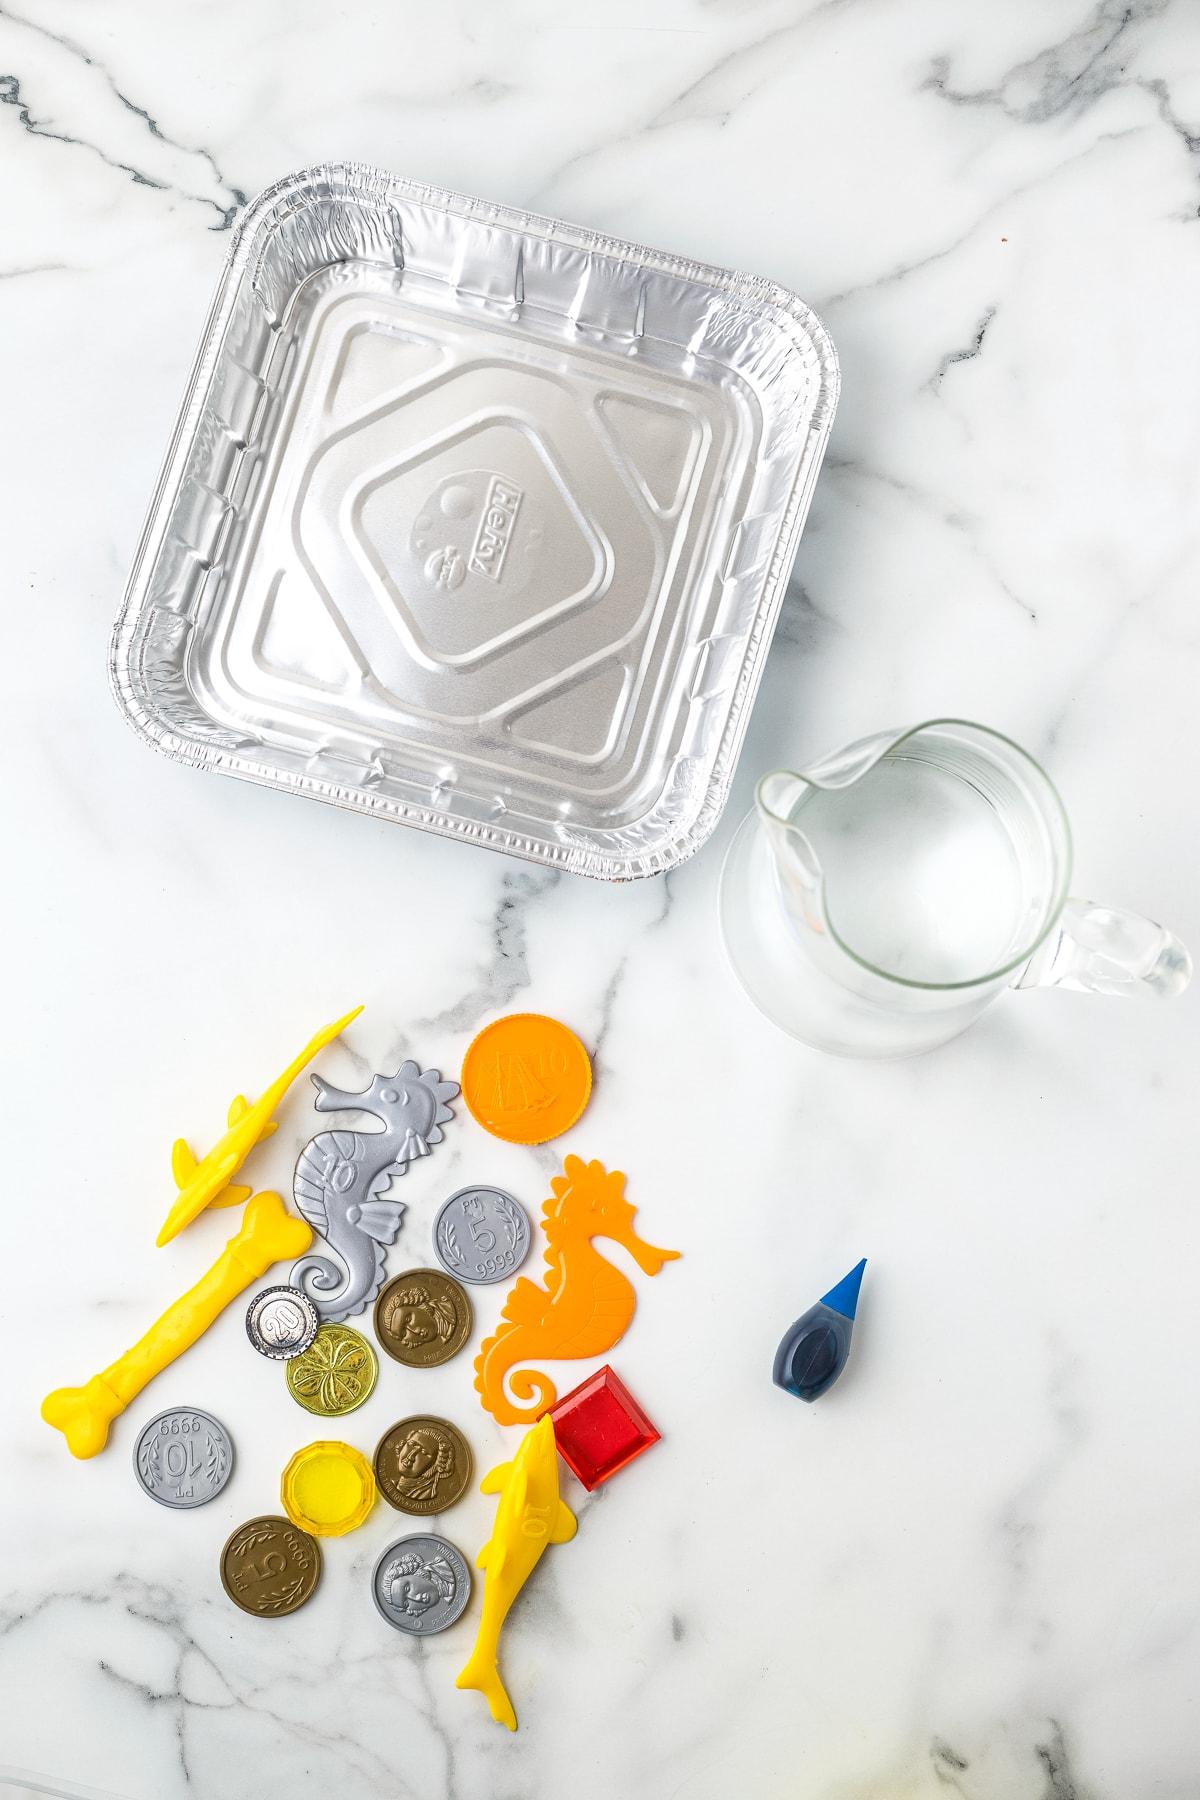 Supplies needed for Ice Block Treasure Hunt